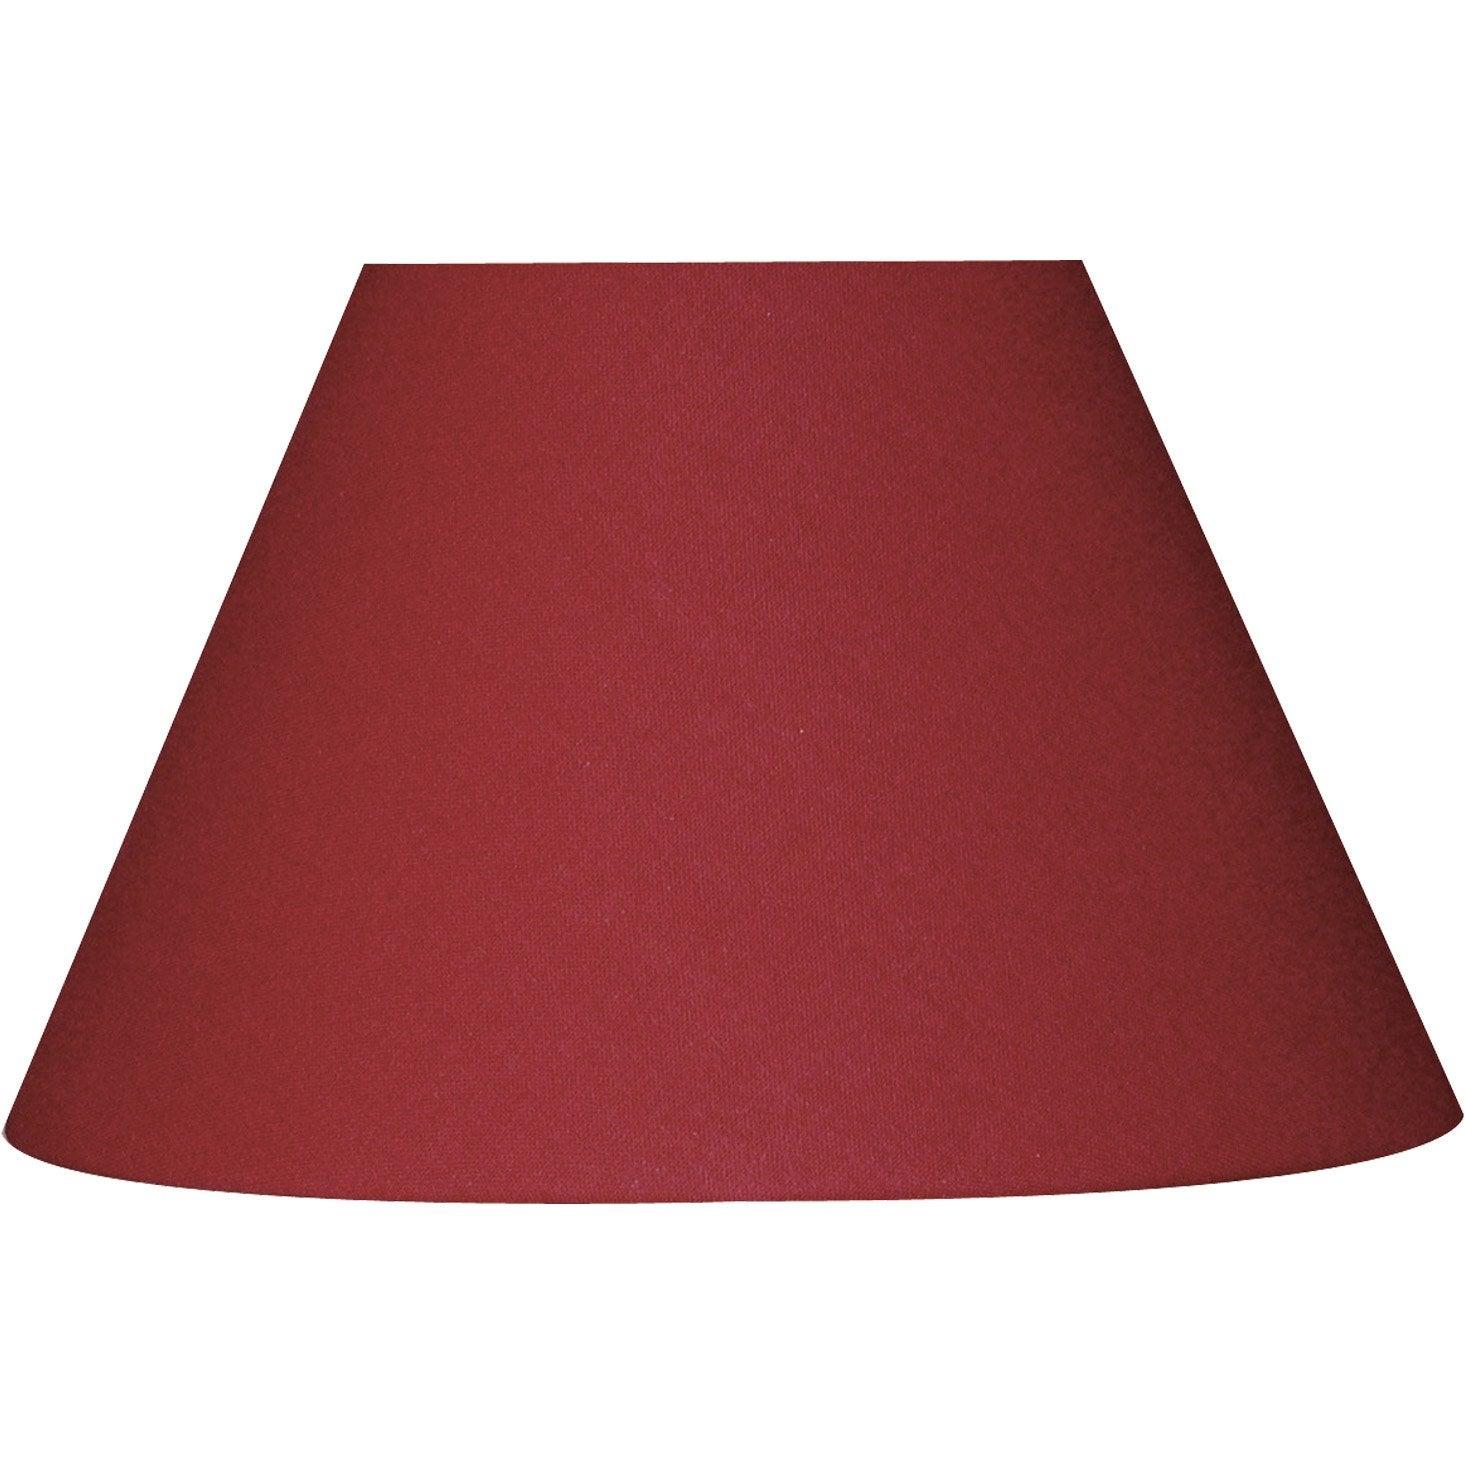 abat jour sweet 60 cm coton cerise leroy merlin. Black Bedroom Furniture Sets. Home Design Ideas